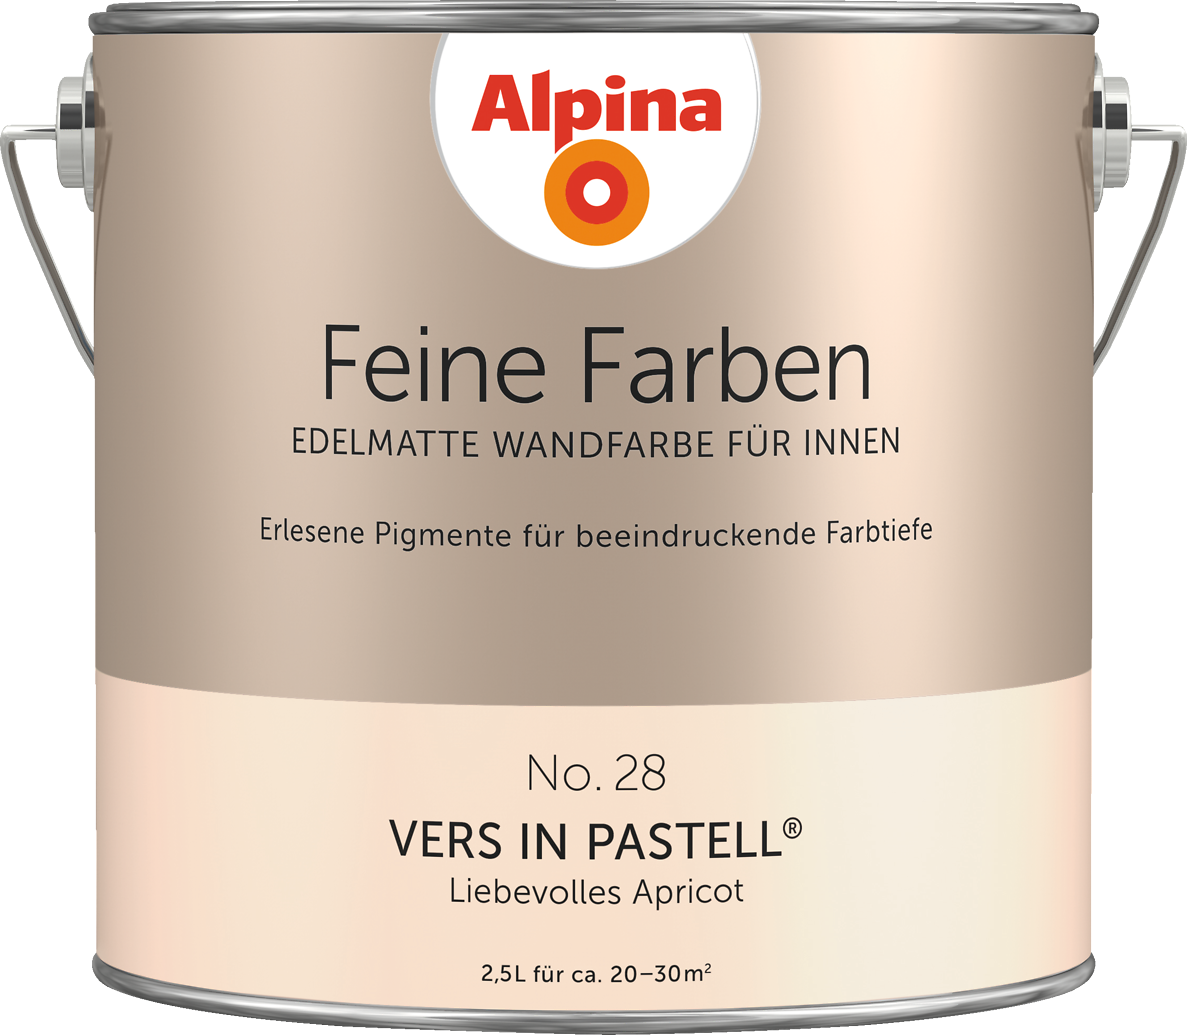 Premium-Wandfarbe. Orange, Apricot: Alpina Feine Farben